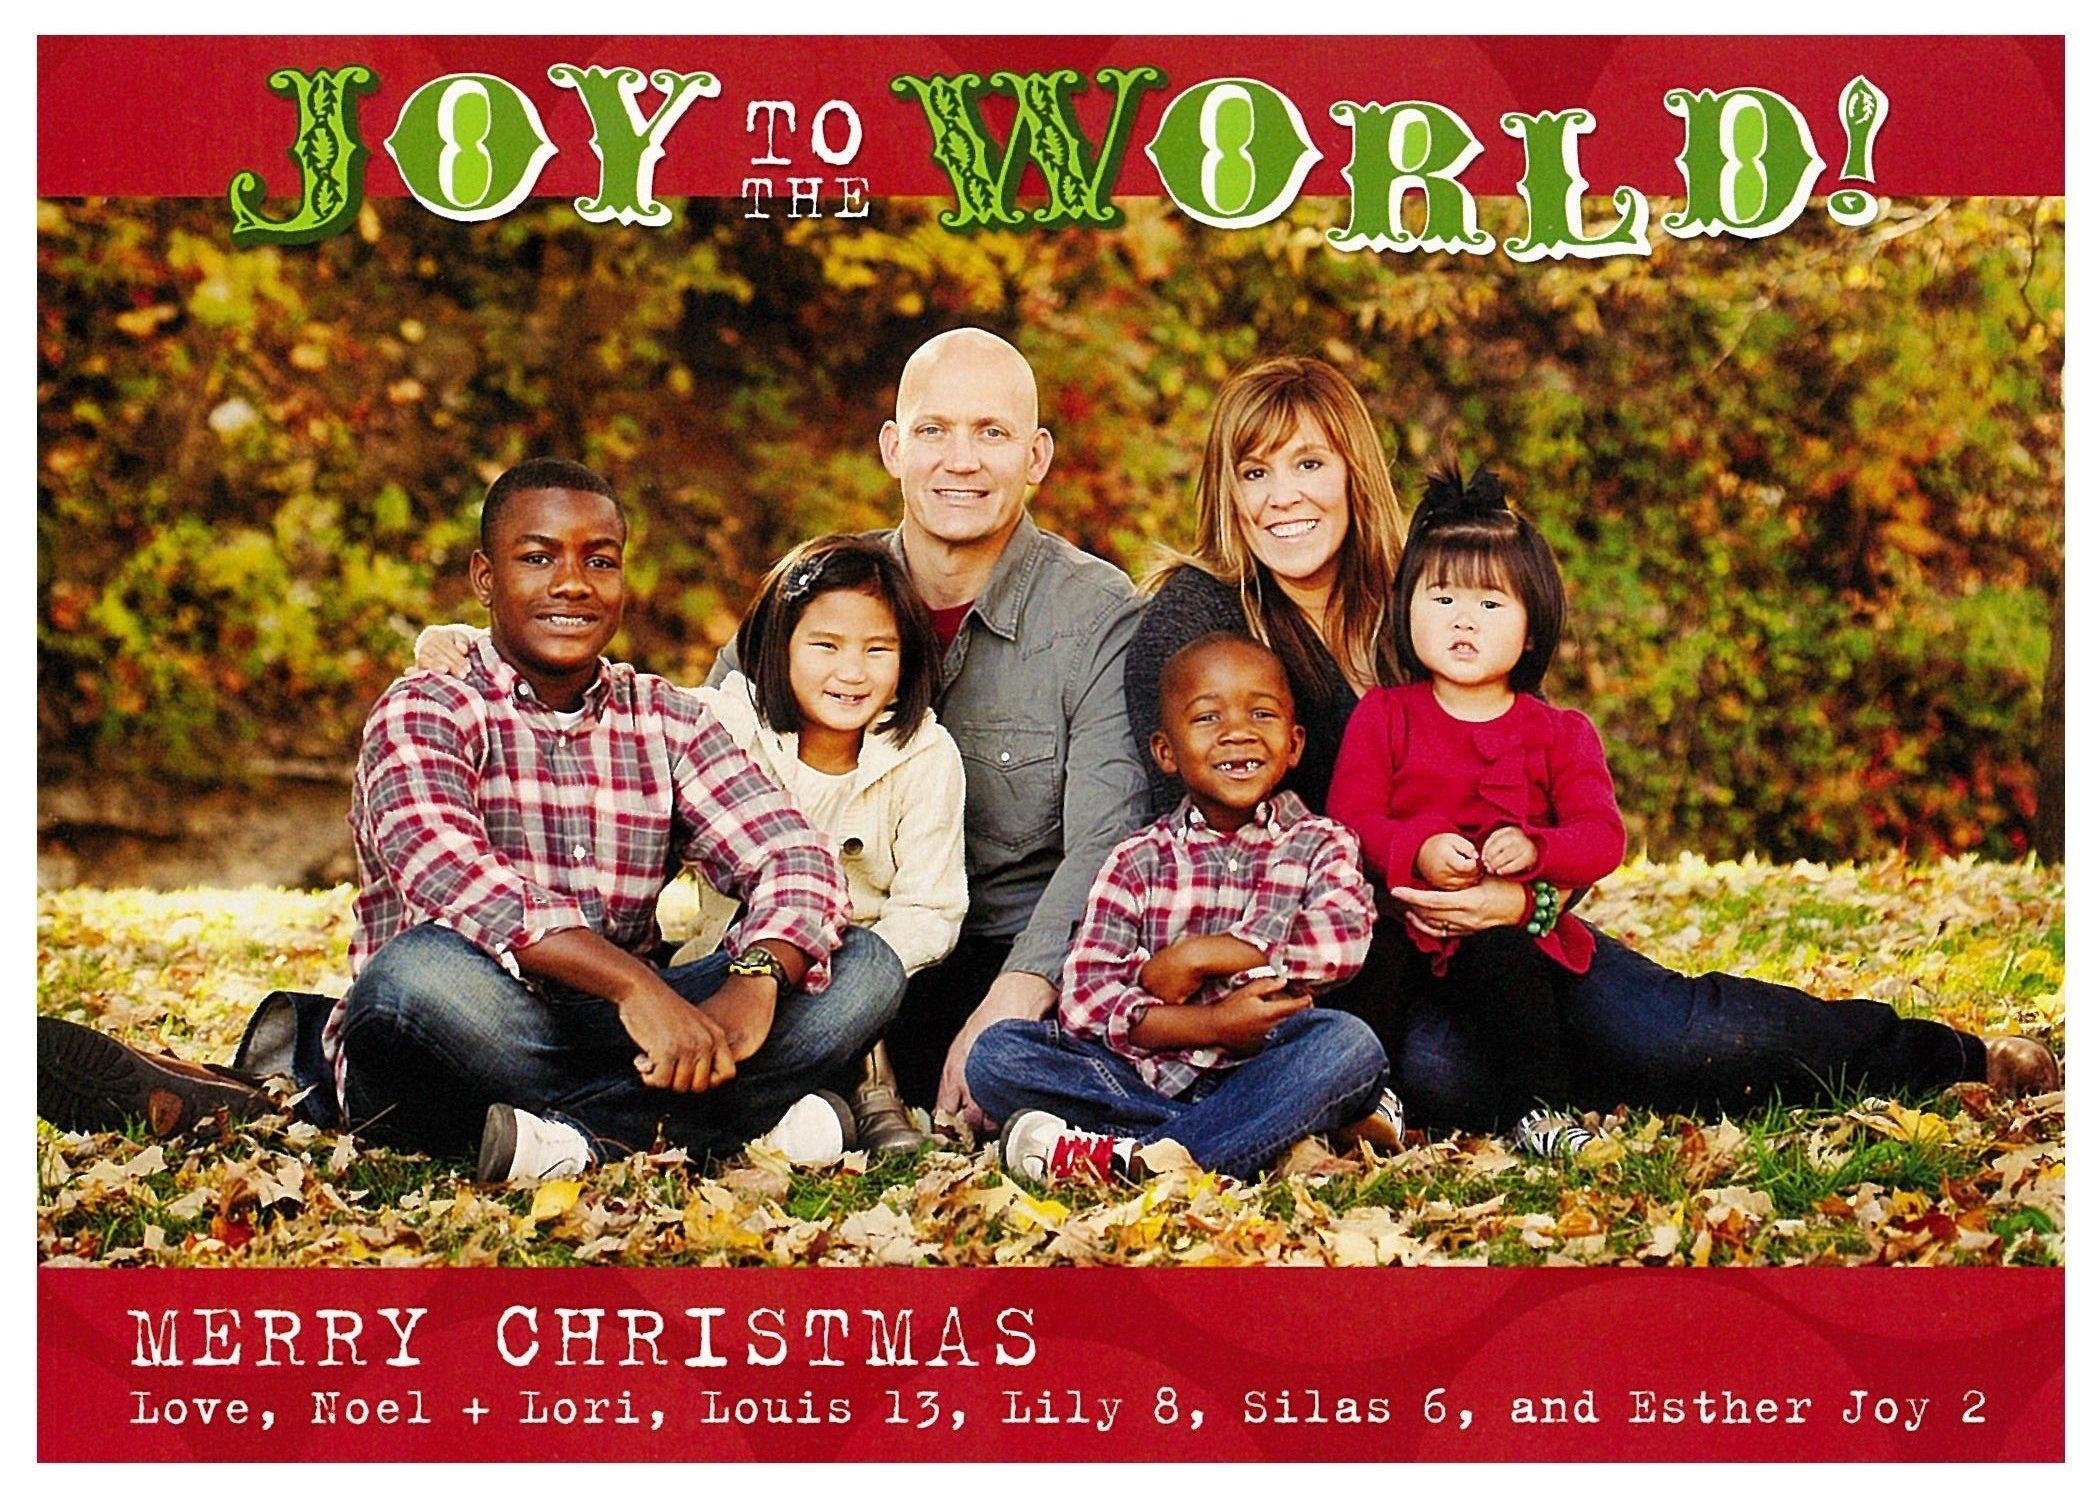 10 Unique Family Christmas Card Picture Ideas christmas cards families outreach home art decor 55978 2020